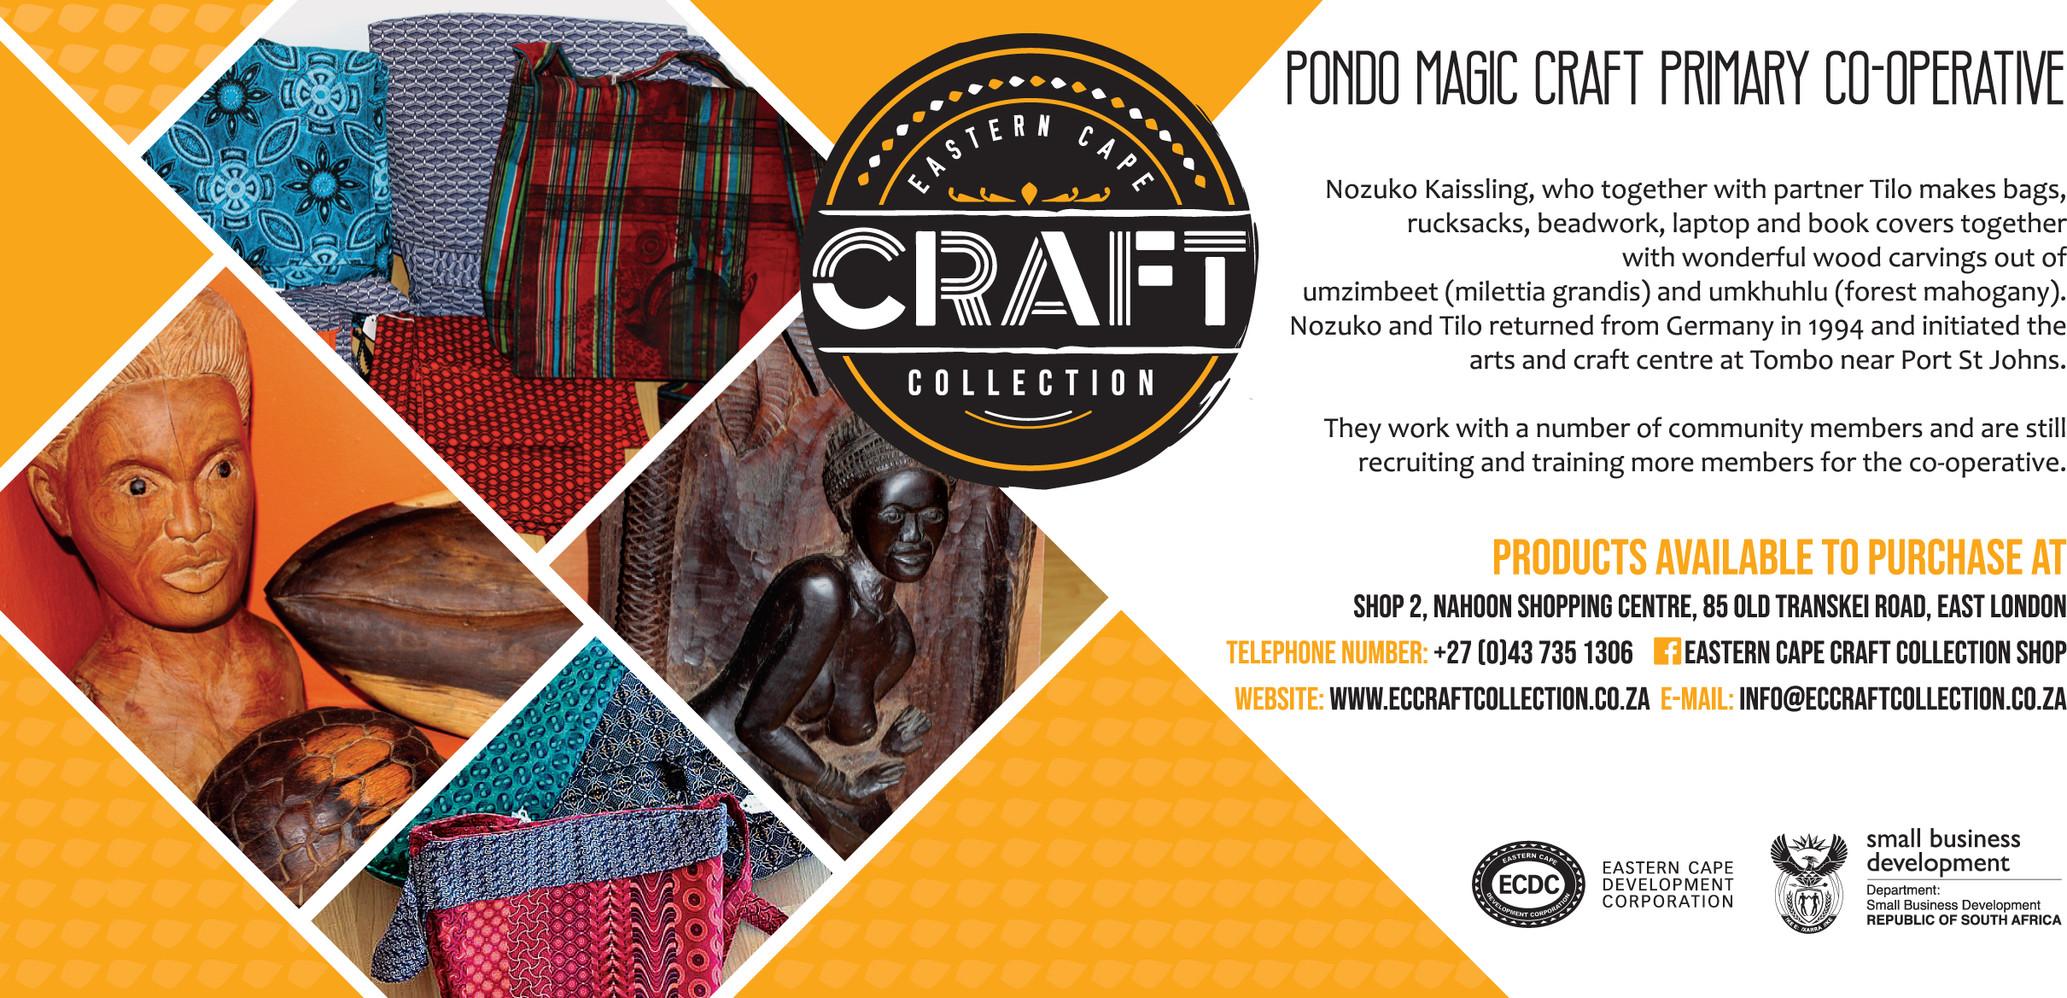 Pondo Magic Craft Primary Co-operative